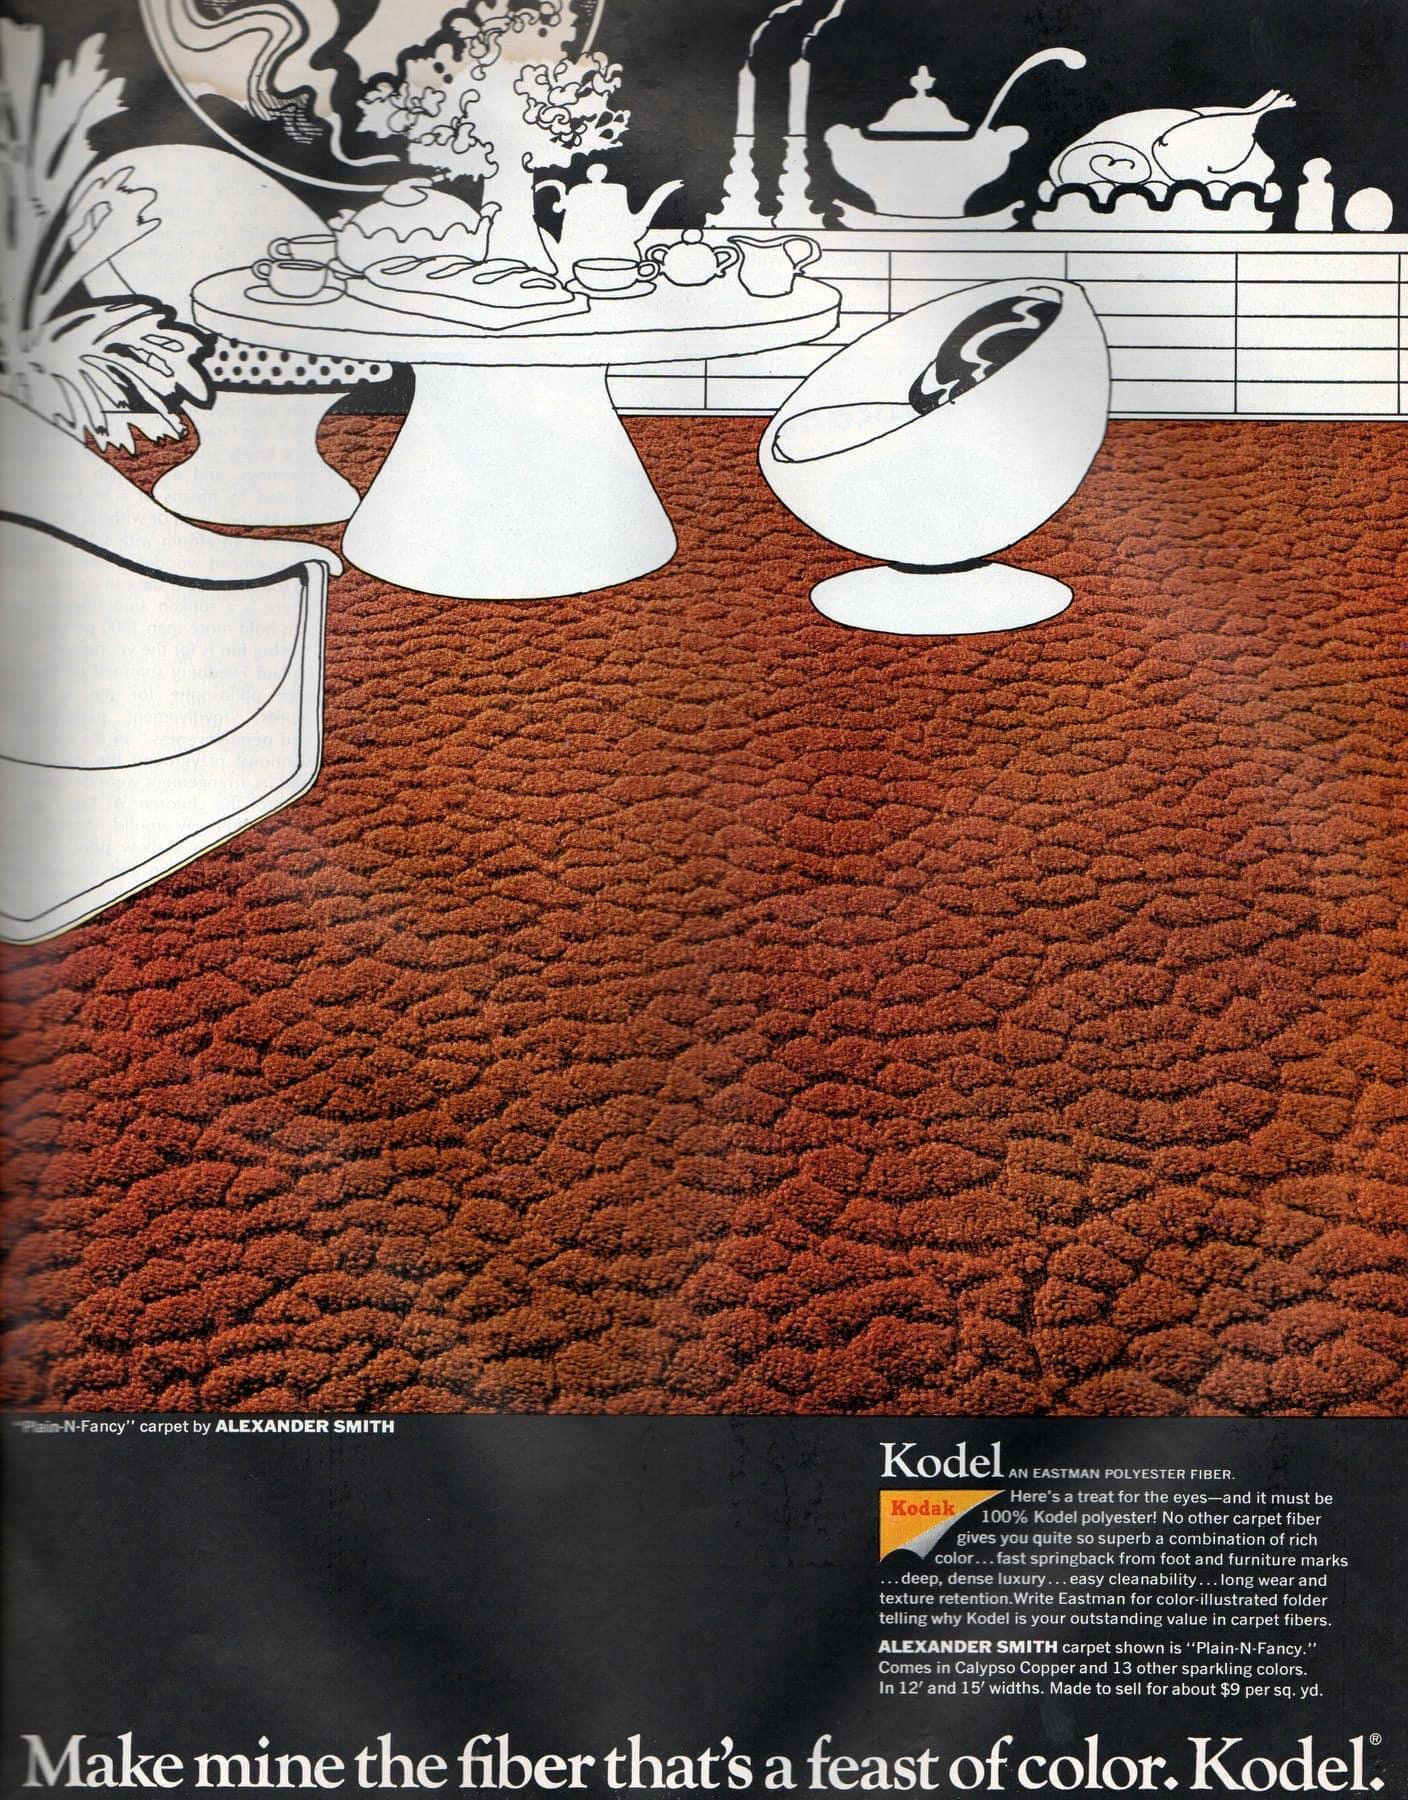 Retro brick red Kodel textured carpet (1968)